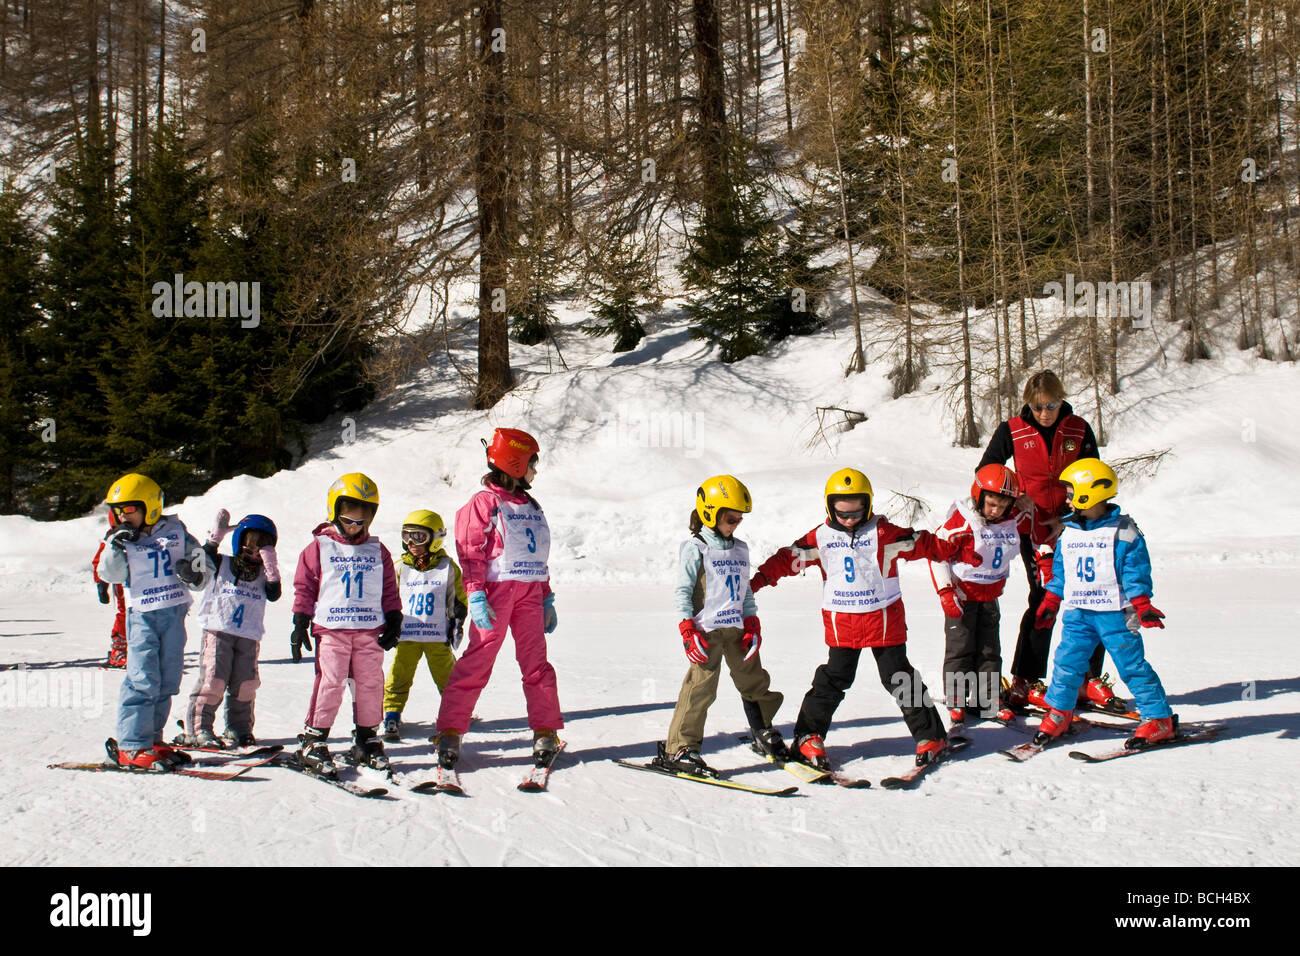 Ski School Gressoney la Trinitè Aosta Italy - Stock Image